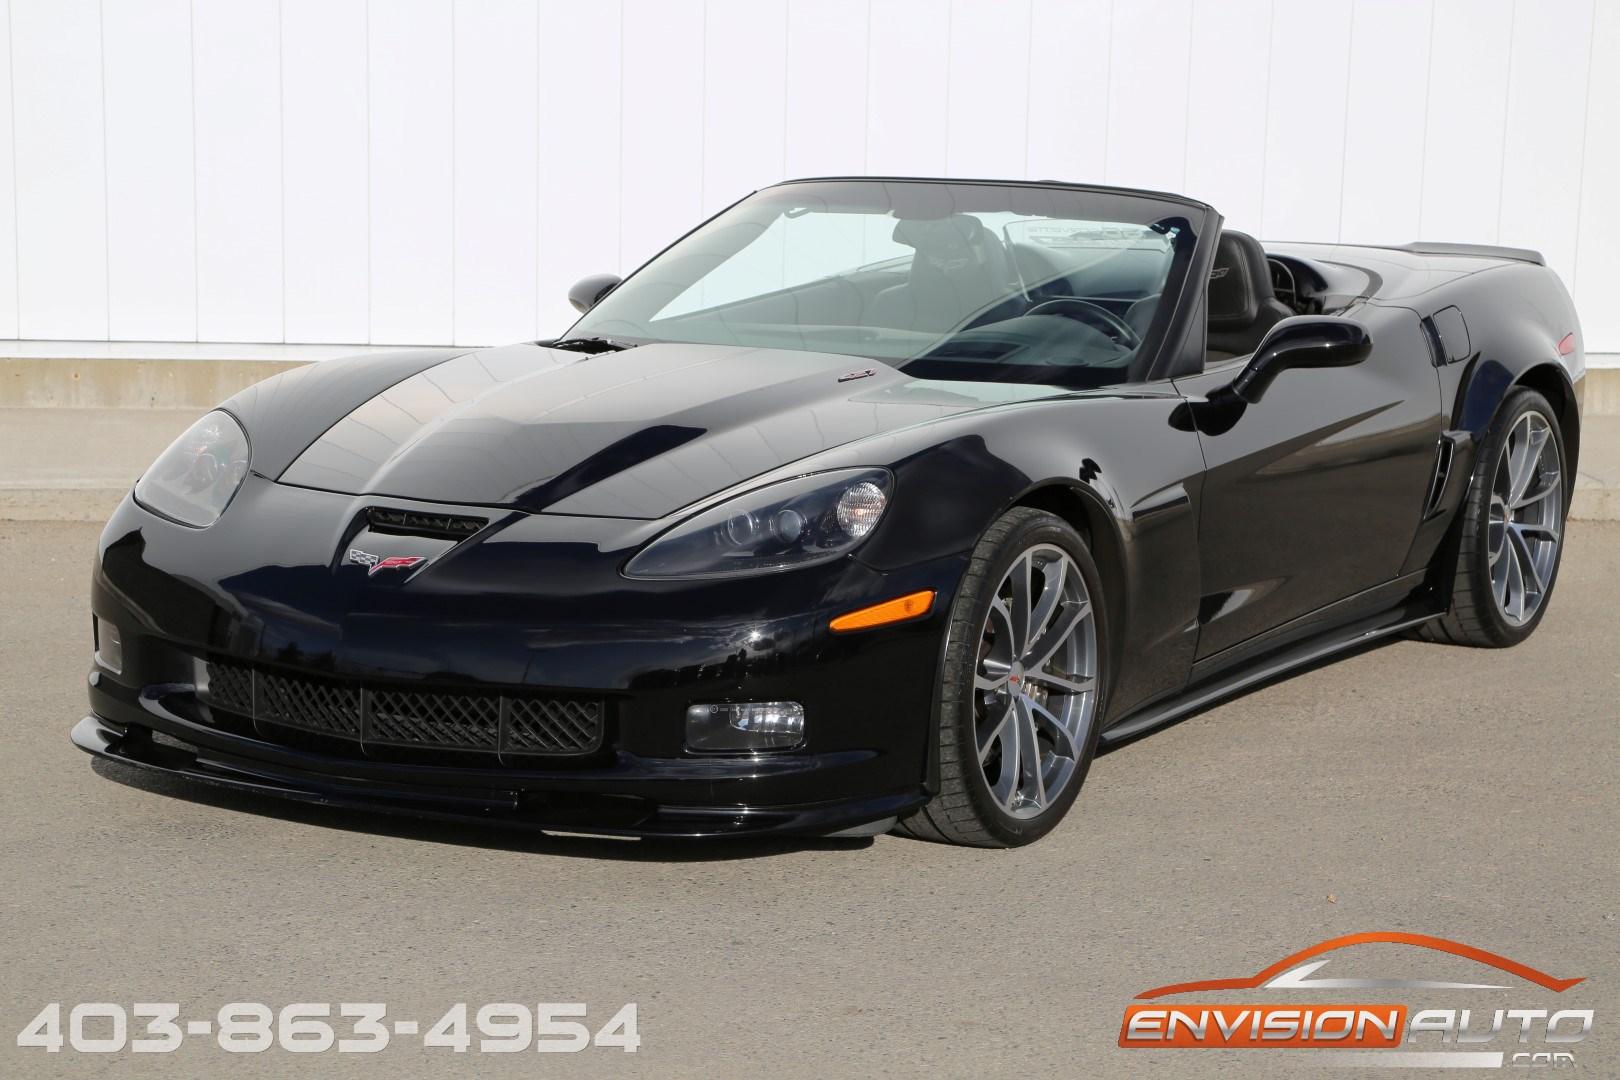 2013 chevrolet corvette 427 convertible 4lt ls7 7 0l v8 505hp envision auto. Black Bedroom Furniture Sets. Home Design Ideas